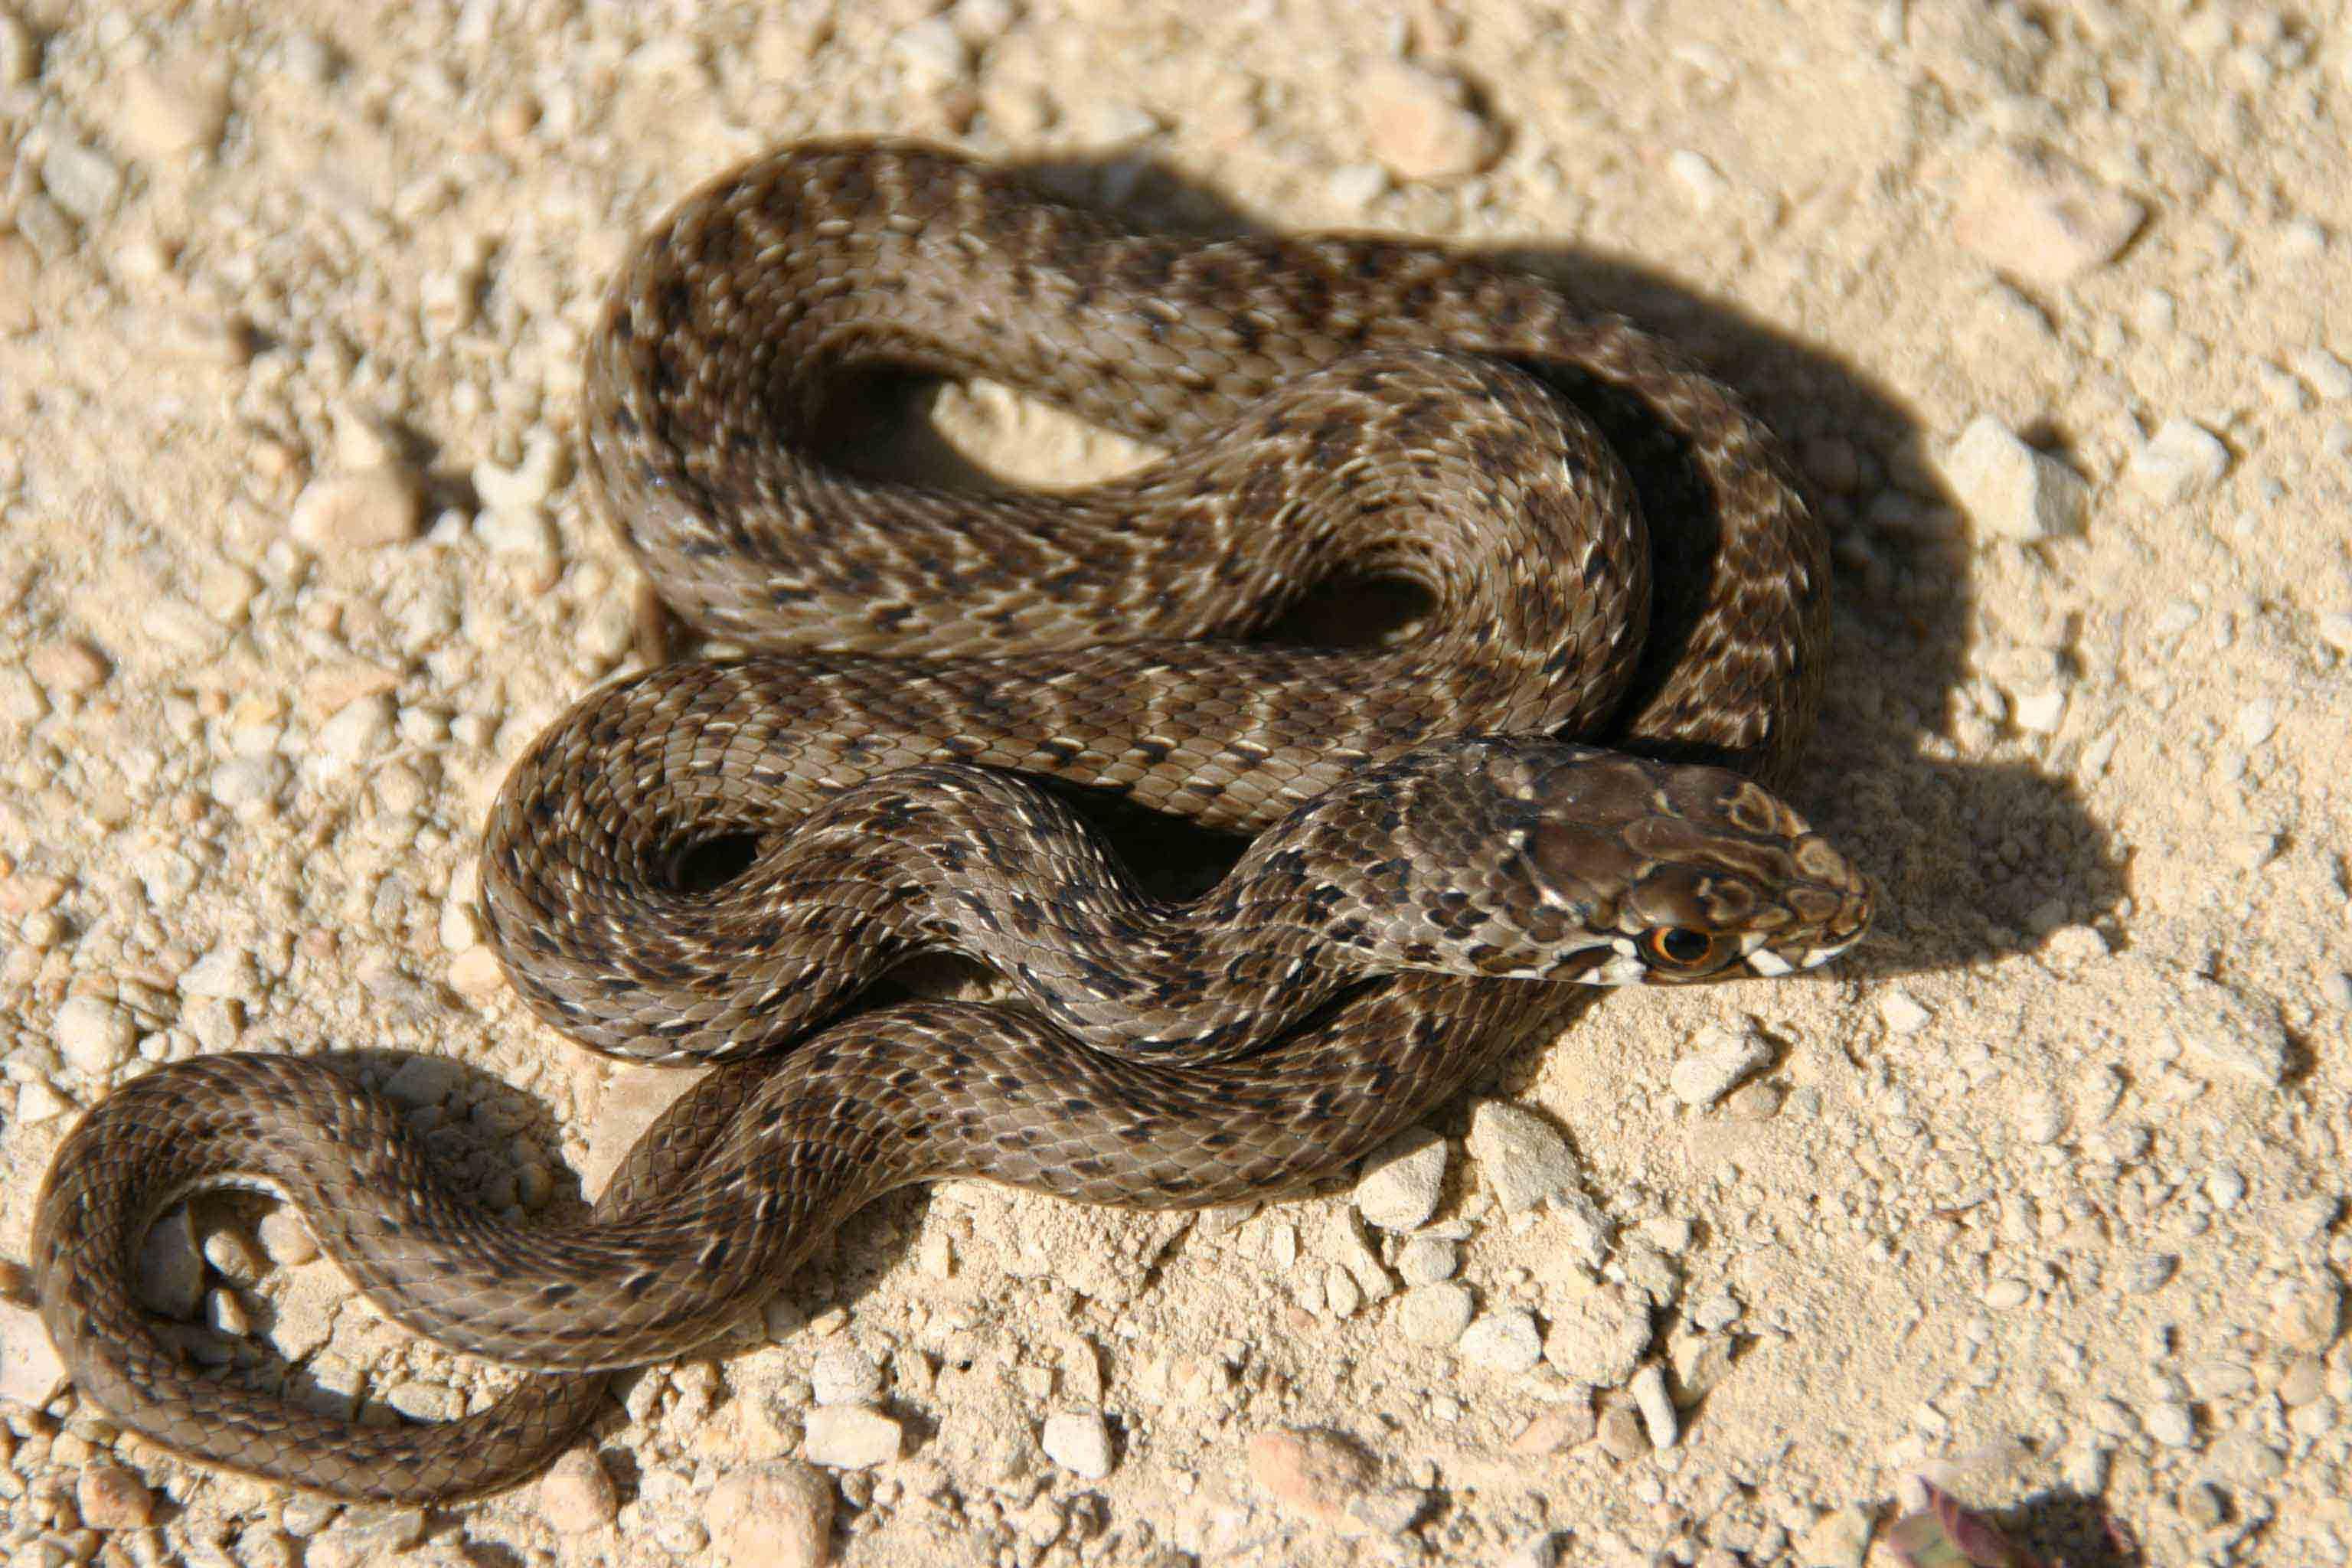 After missing a big Horseshoe whipsnake I caught this juvenile Montpellier snake (Malpolon monspessulanus)